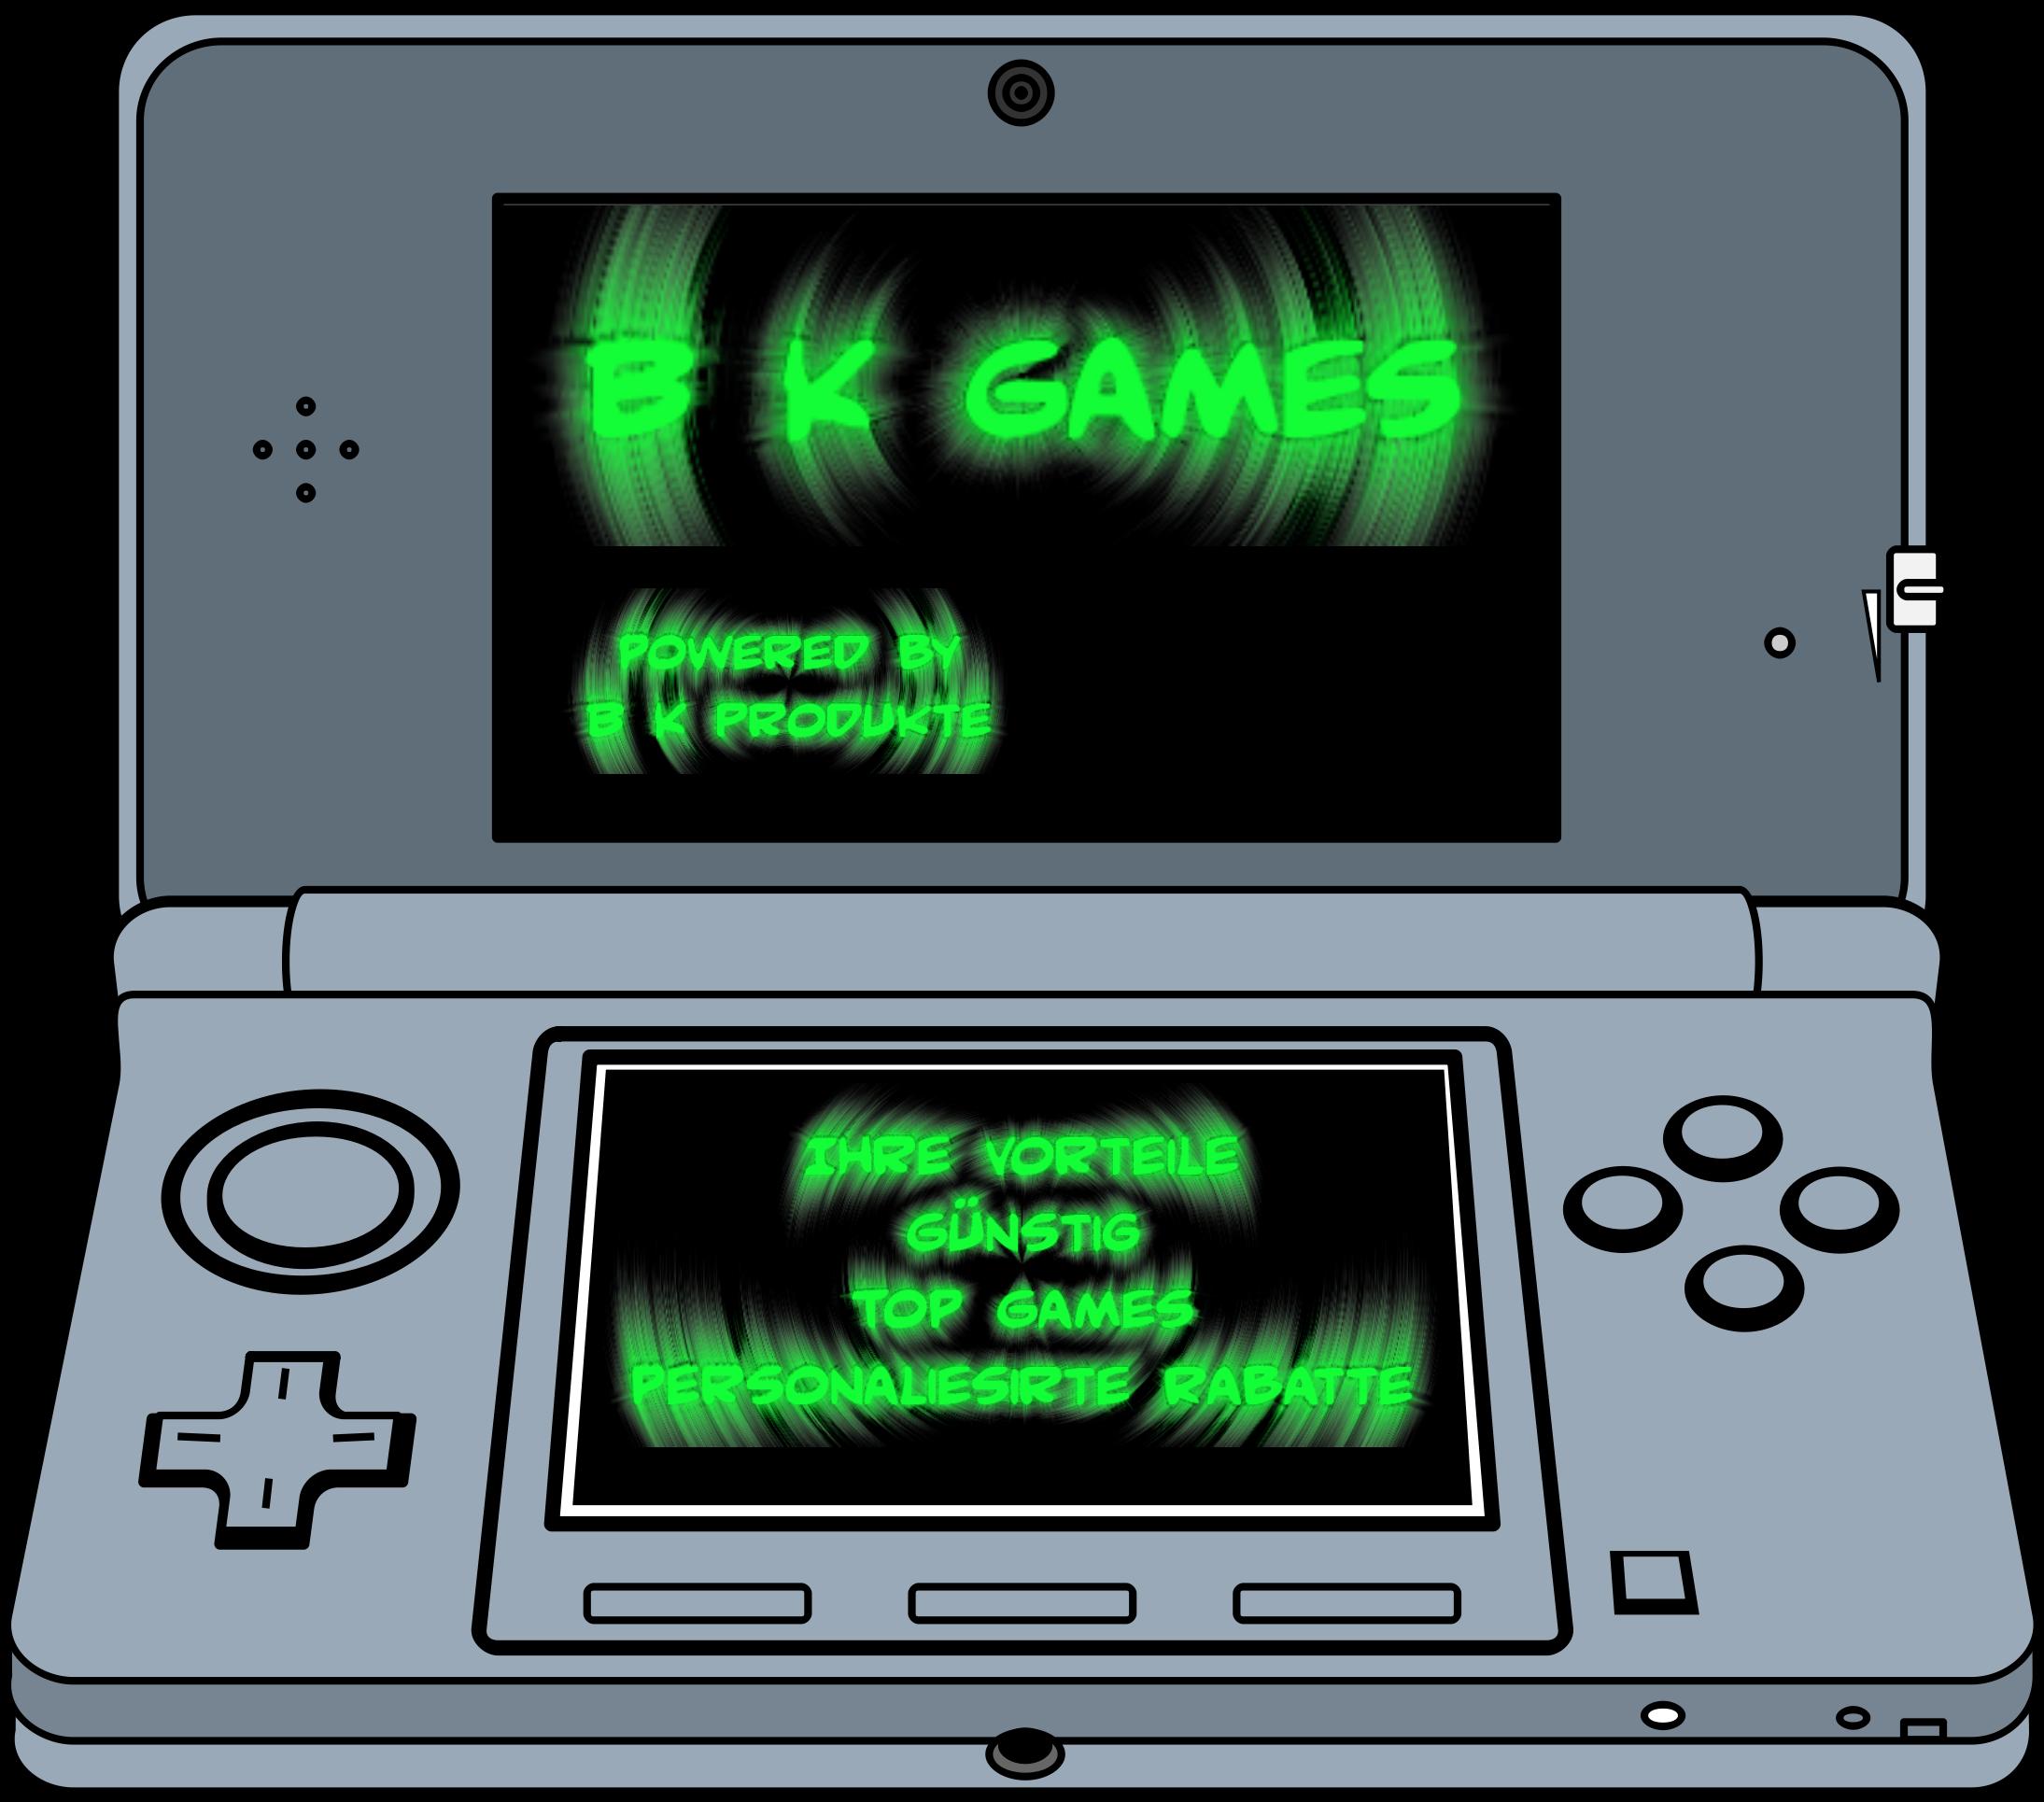 B K Games